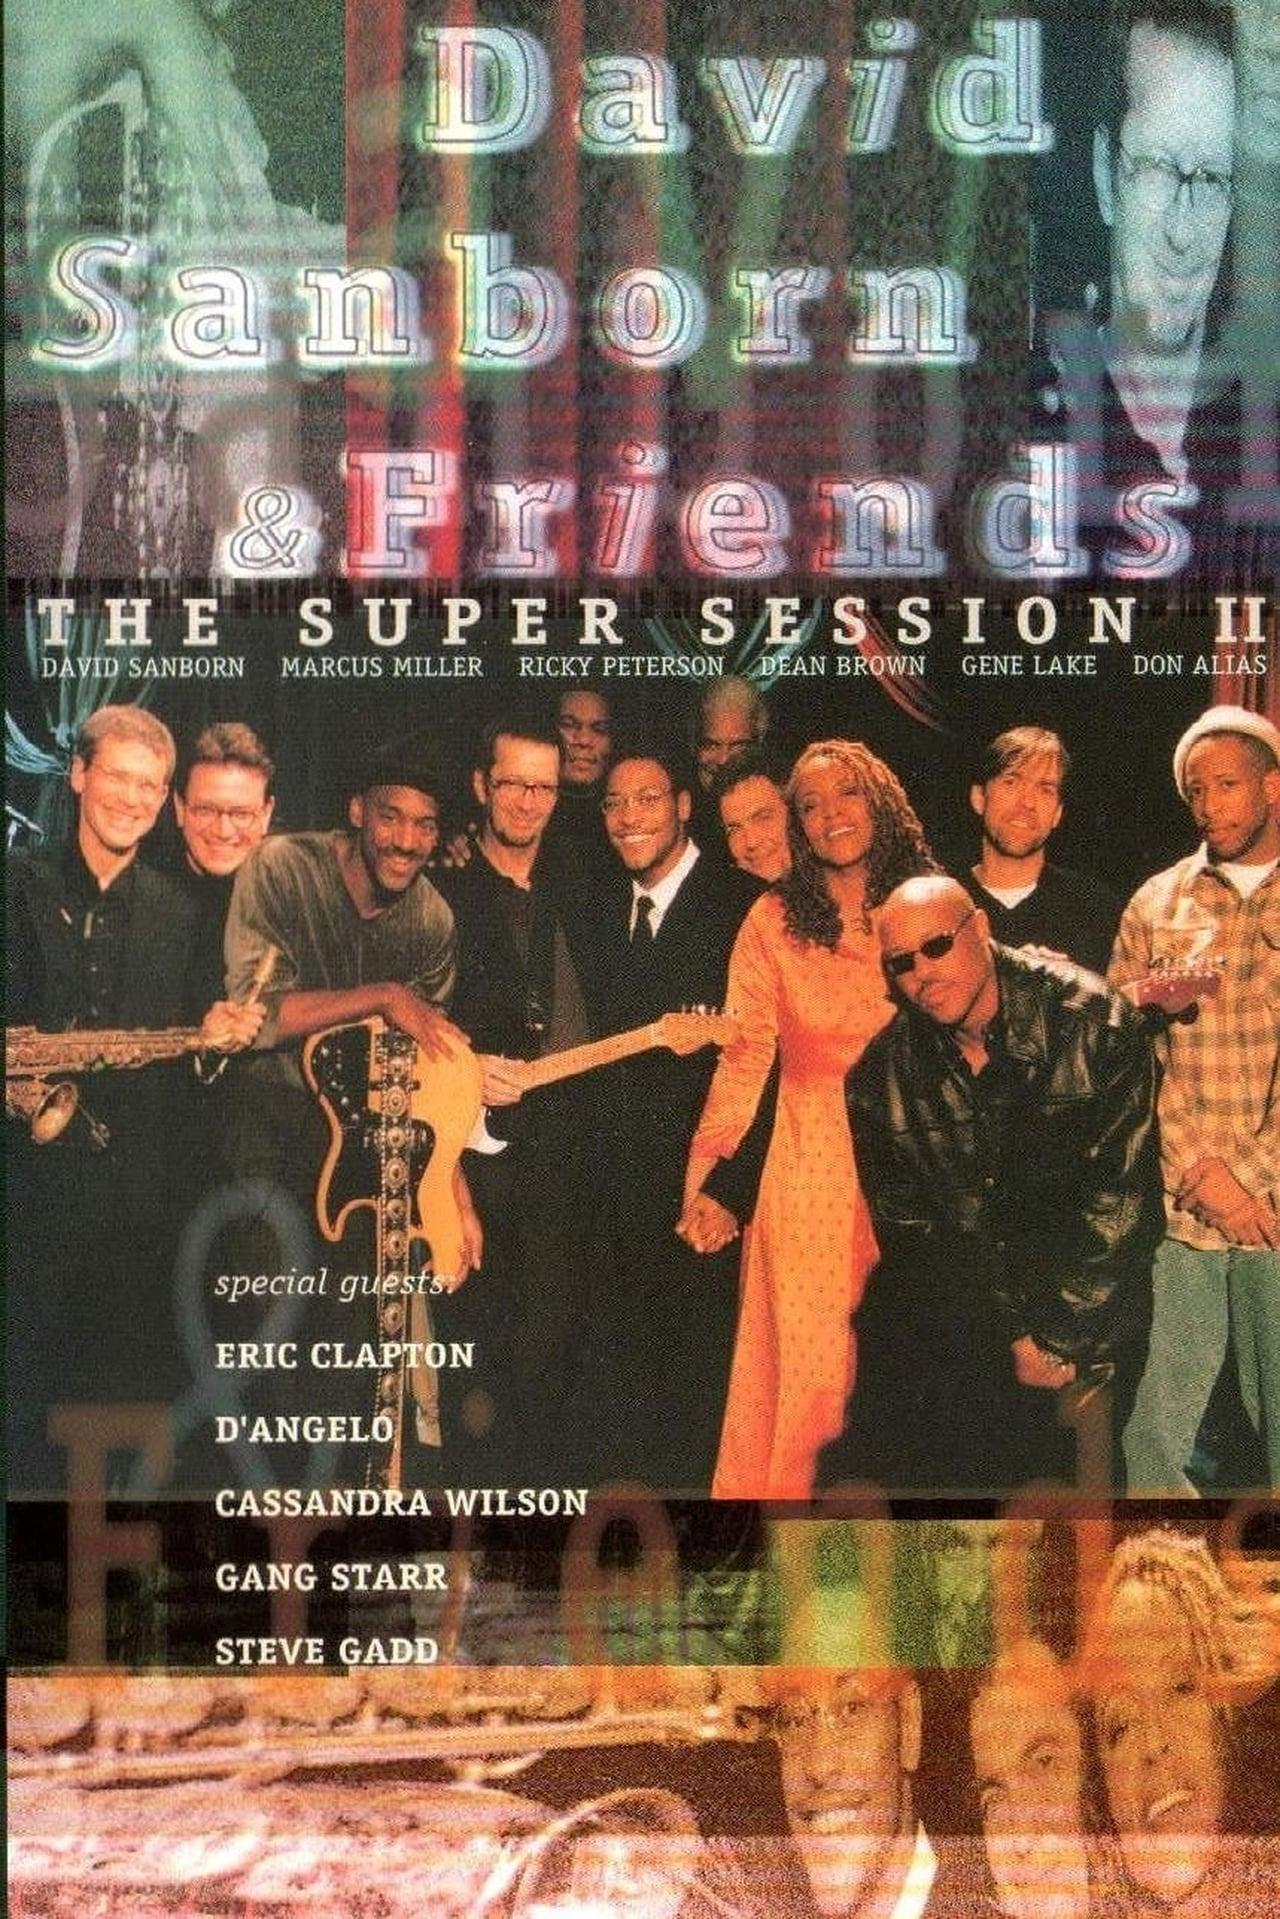 David Sanborn & Friends - The Super Session II